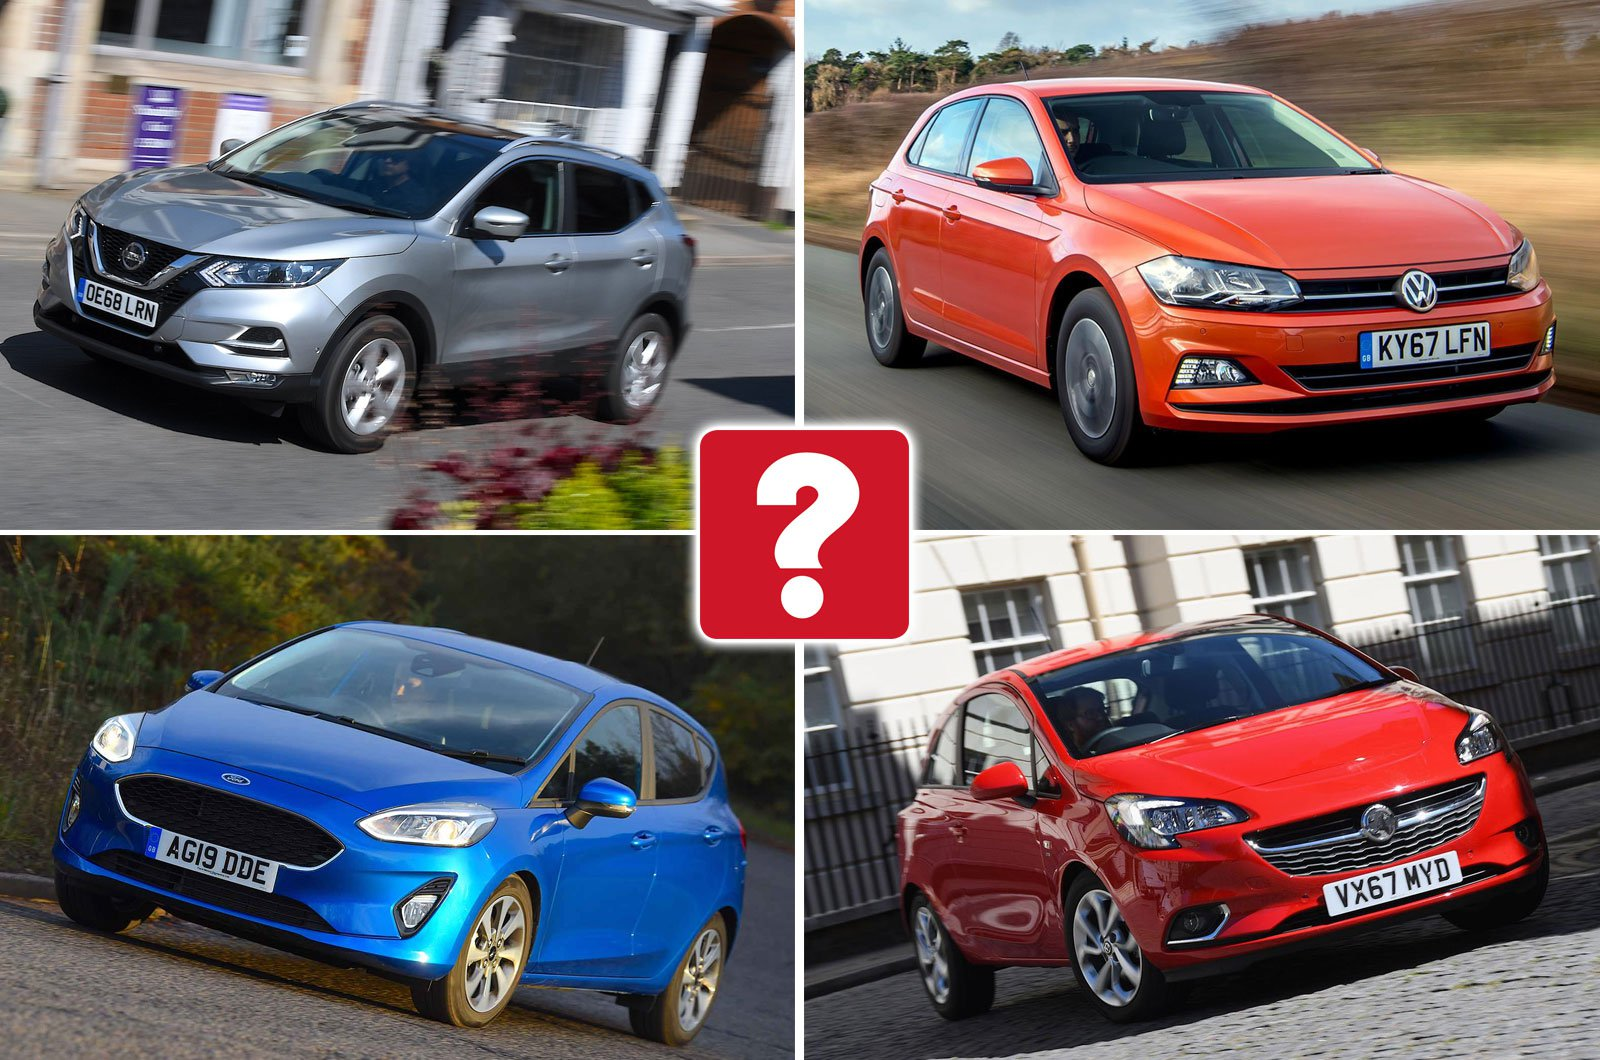 Nissan Qashqai, Volkswagen Polo, Ford Fiesta, Vauxhall Corsa